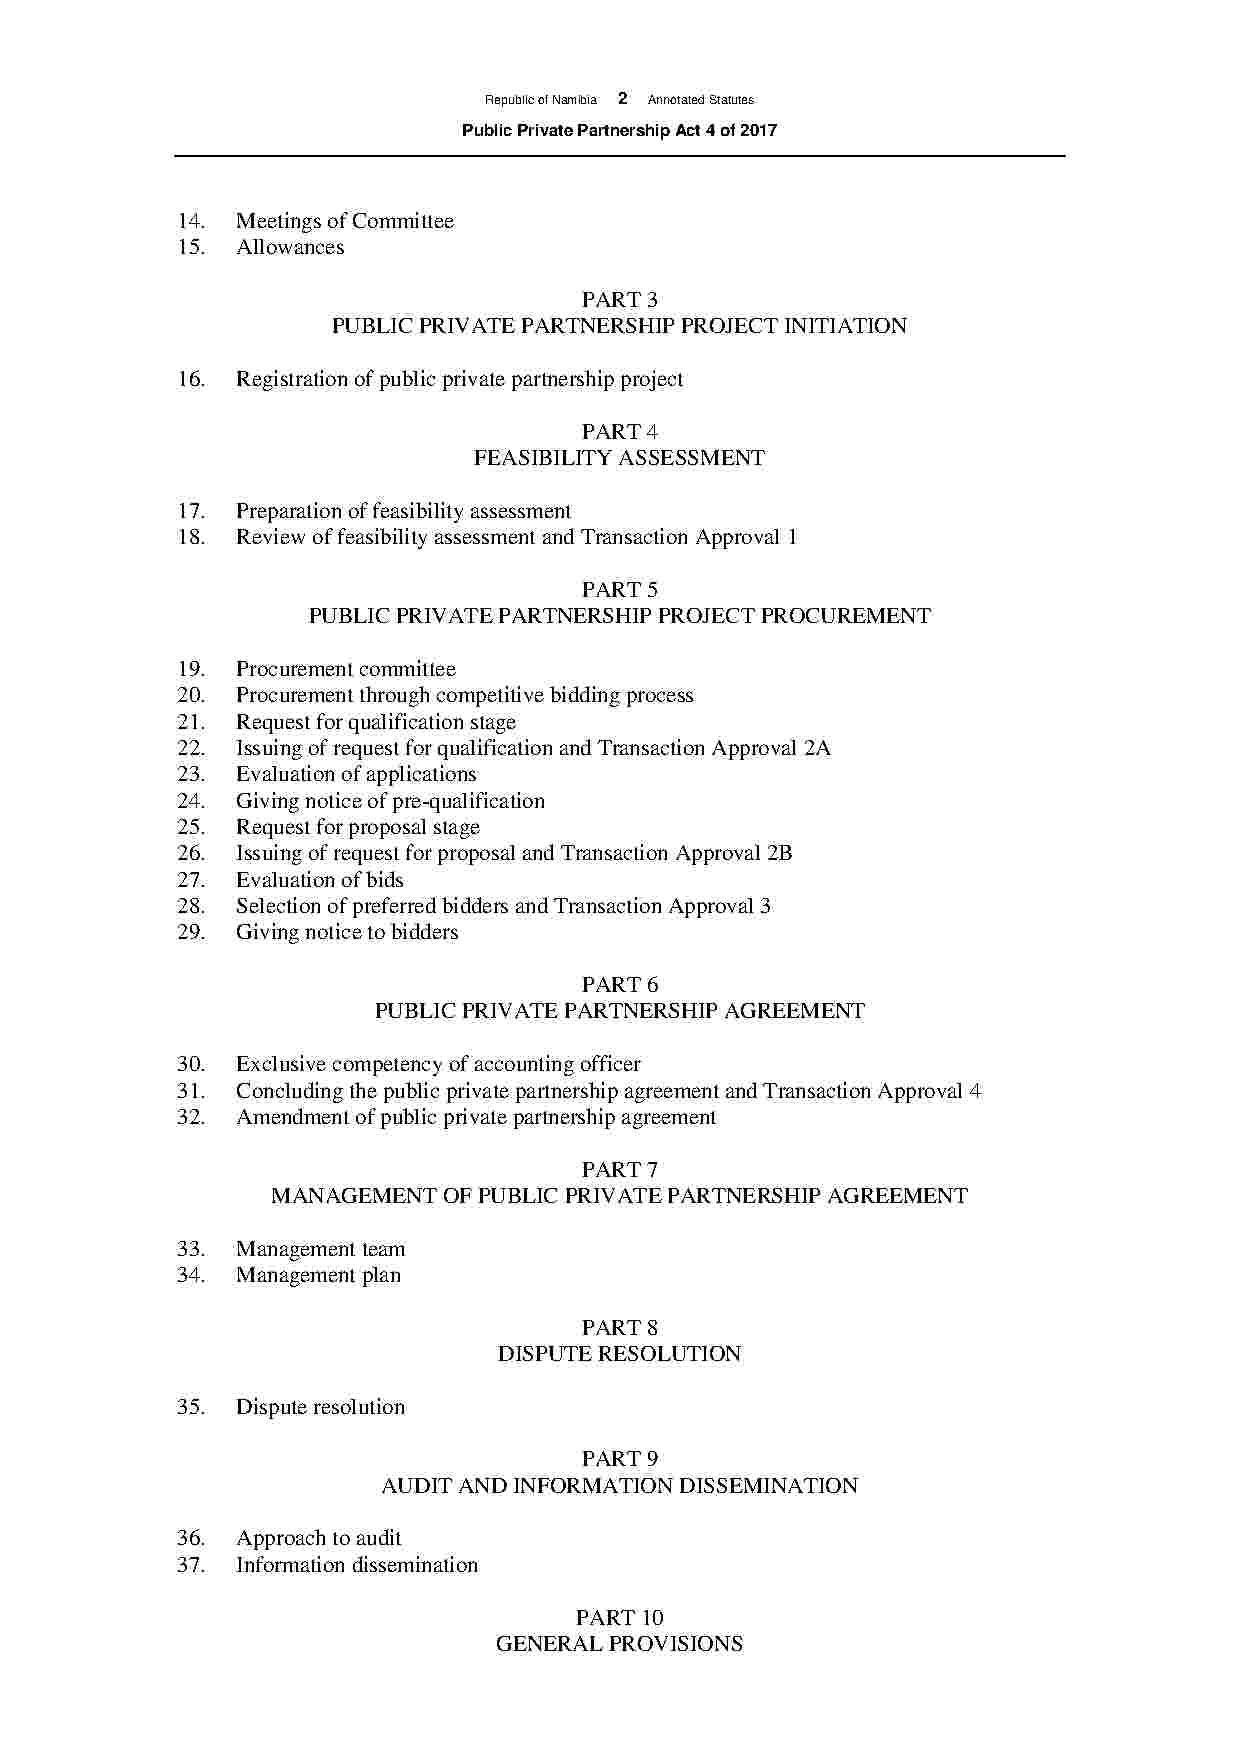 Partnership Agreement Amendment Public private